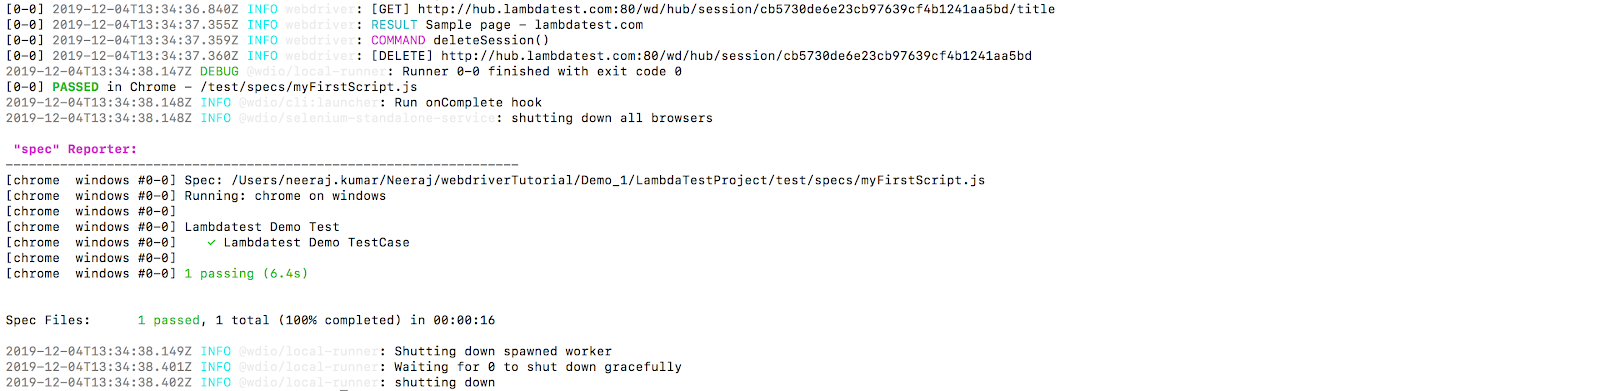 lambdatest_capability_generator